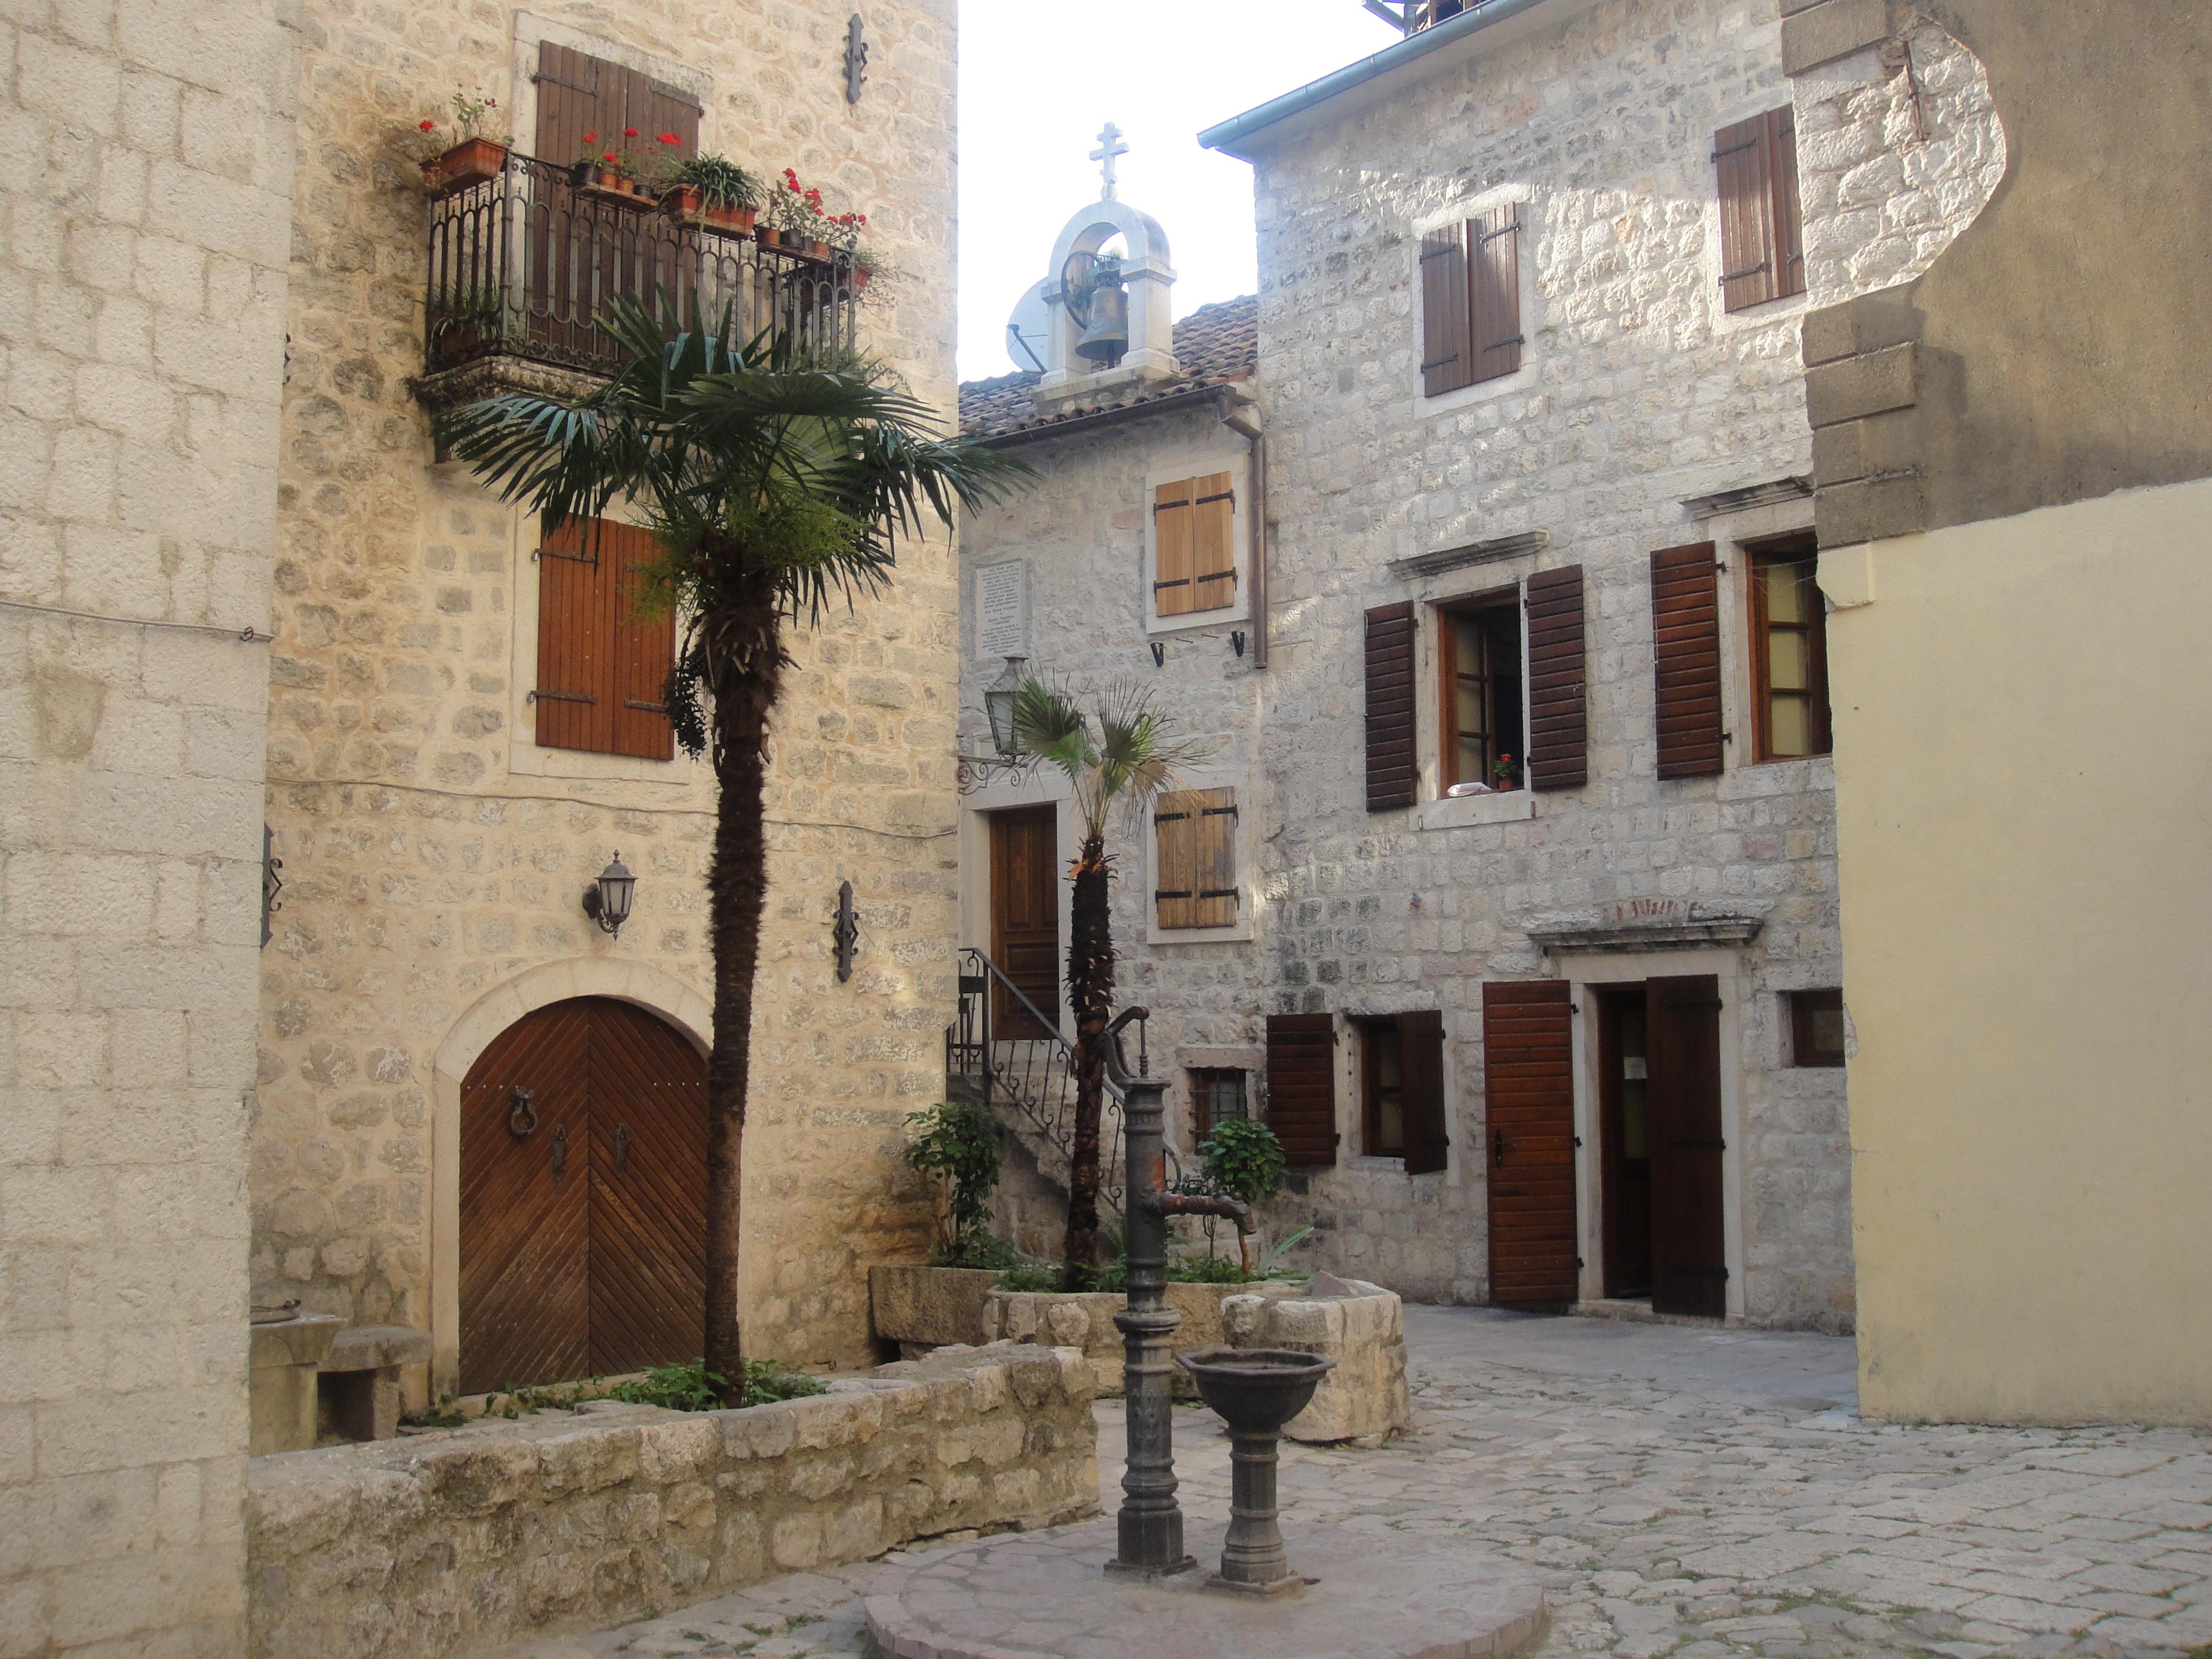 kotor-old-town